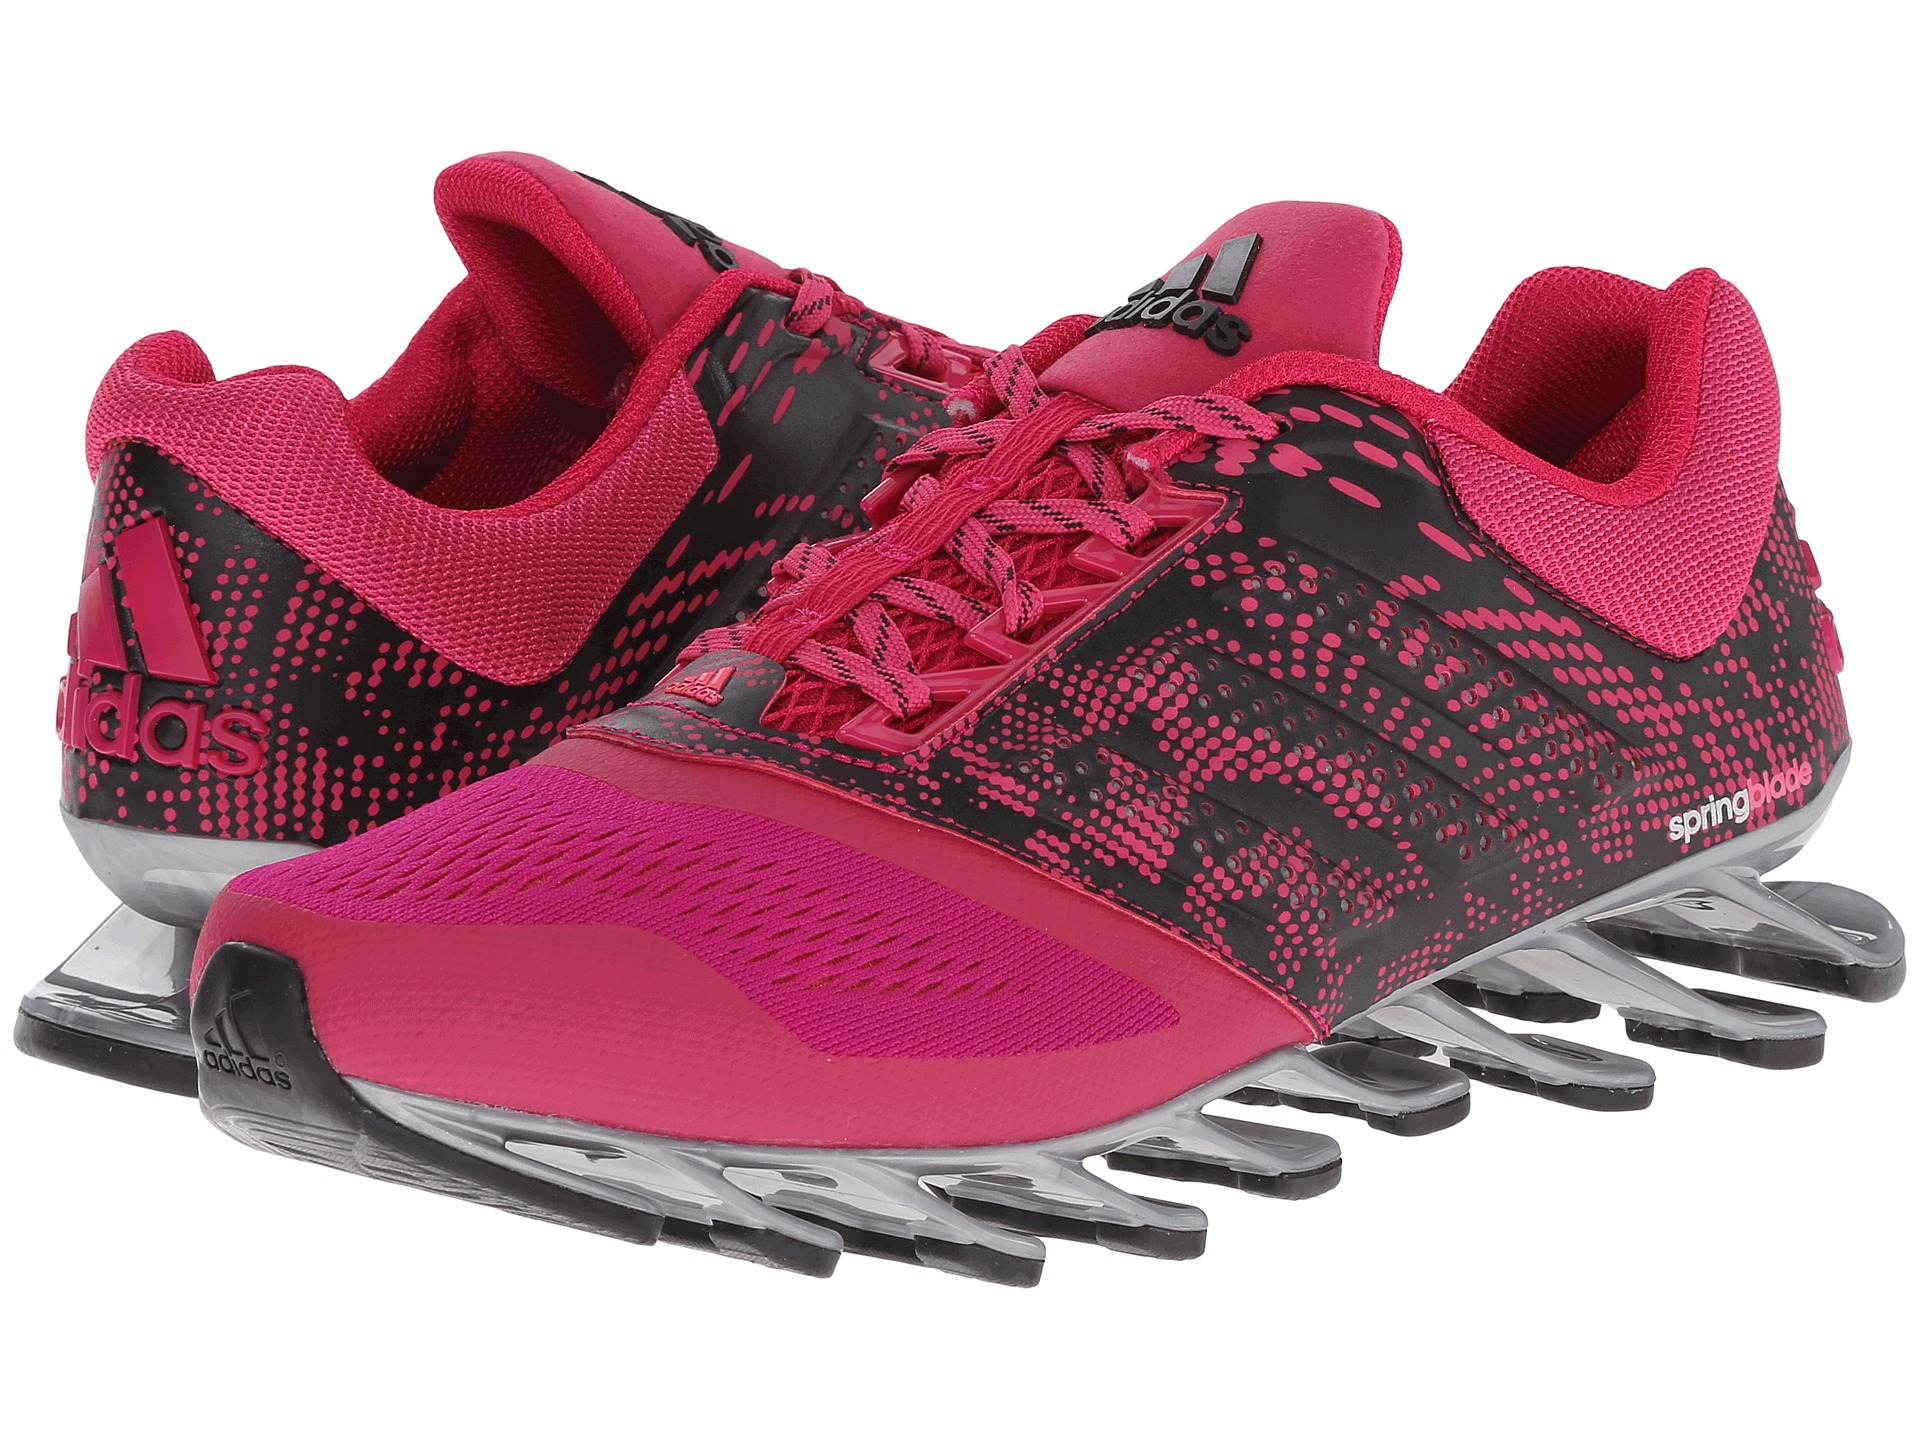 Lyst - adidas Springblade Drive 2 Mesh Low-Top Sneakers in ...